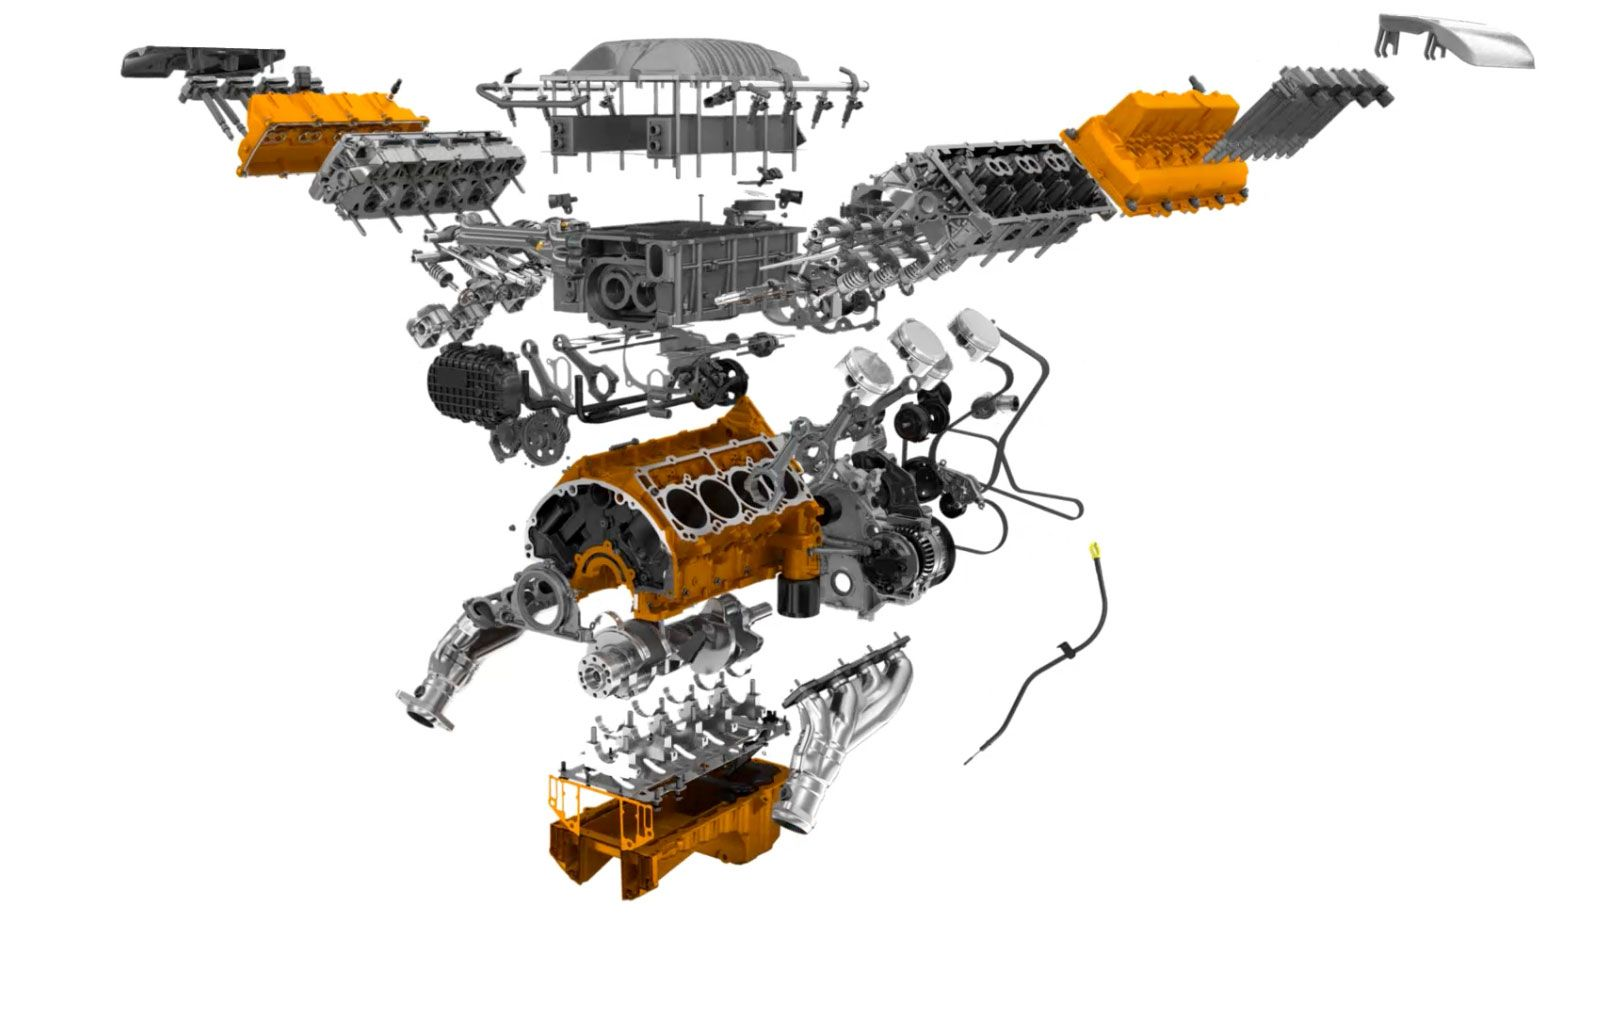 small resolution of 2015 challenger hemi engine diagram wiring diagram mega 2015 dodge challenger engine diagram 707 hp 6